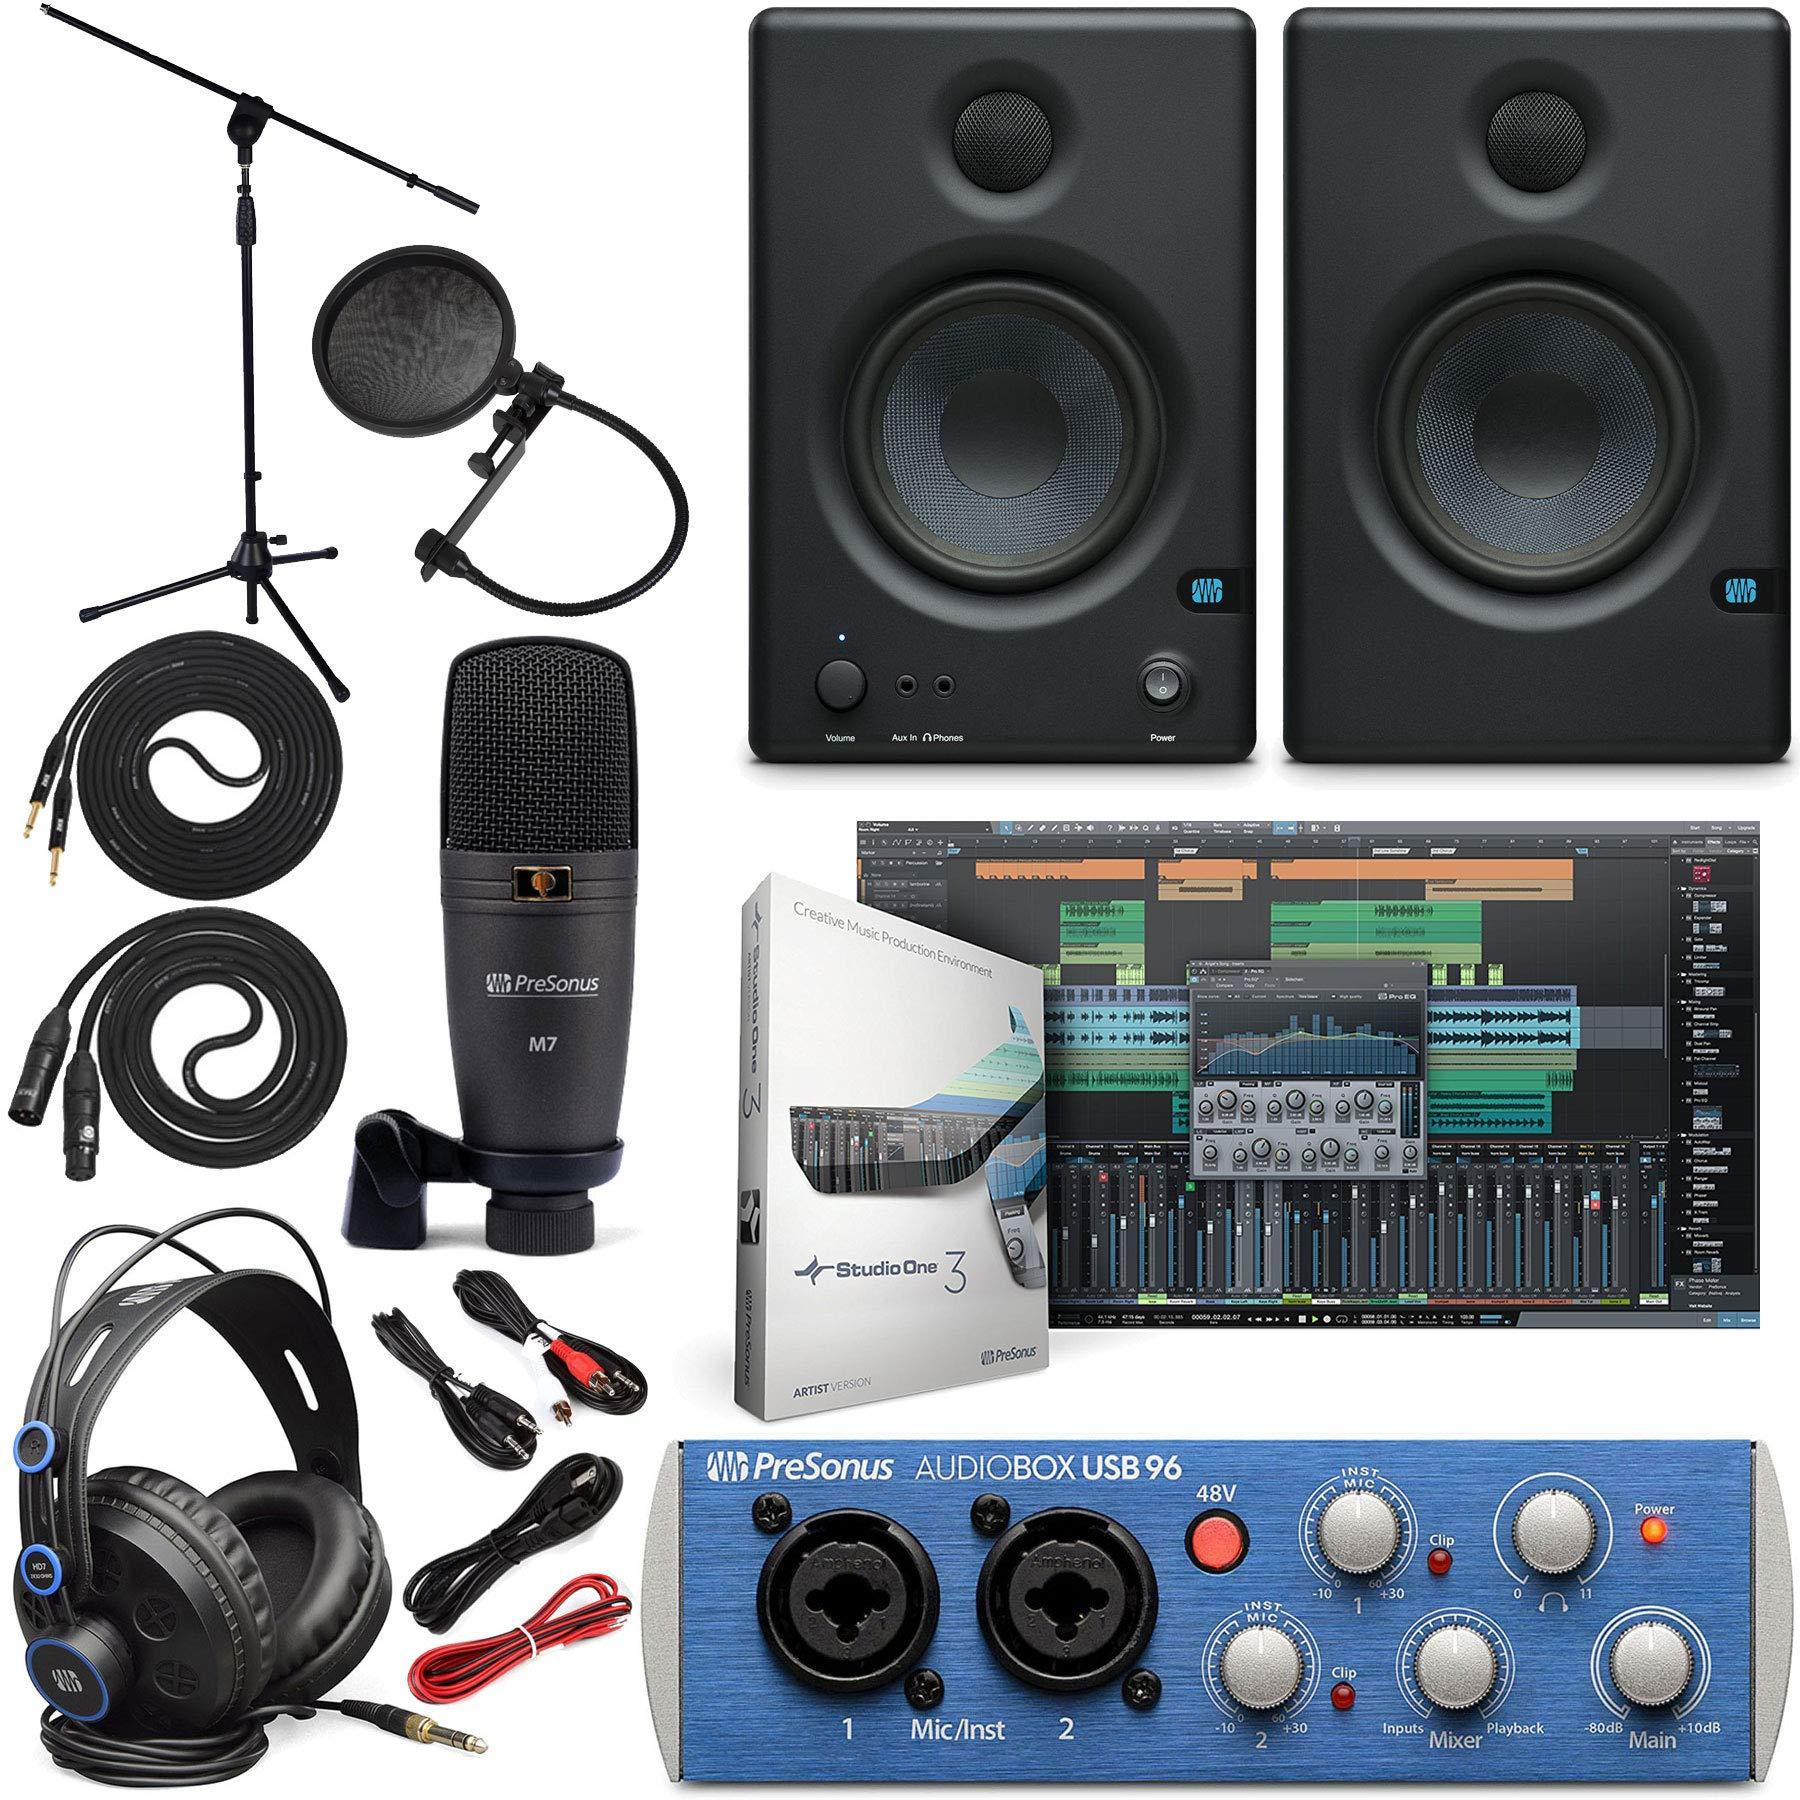 Presonus AudioBox 96 Audio Interface Full Studio Bundle with Studio One Artist Software Pack w/Eris 4.5 Pair Studio Monitors and 1/4'' TRS to TRS Instrument Cable